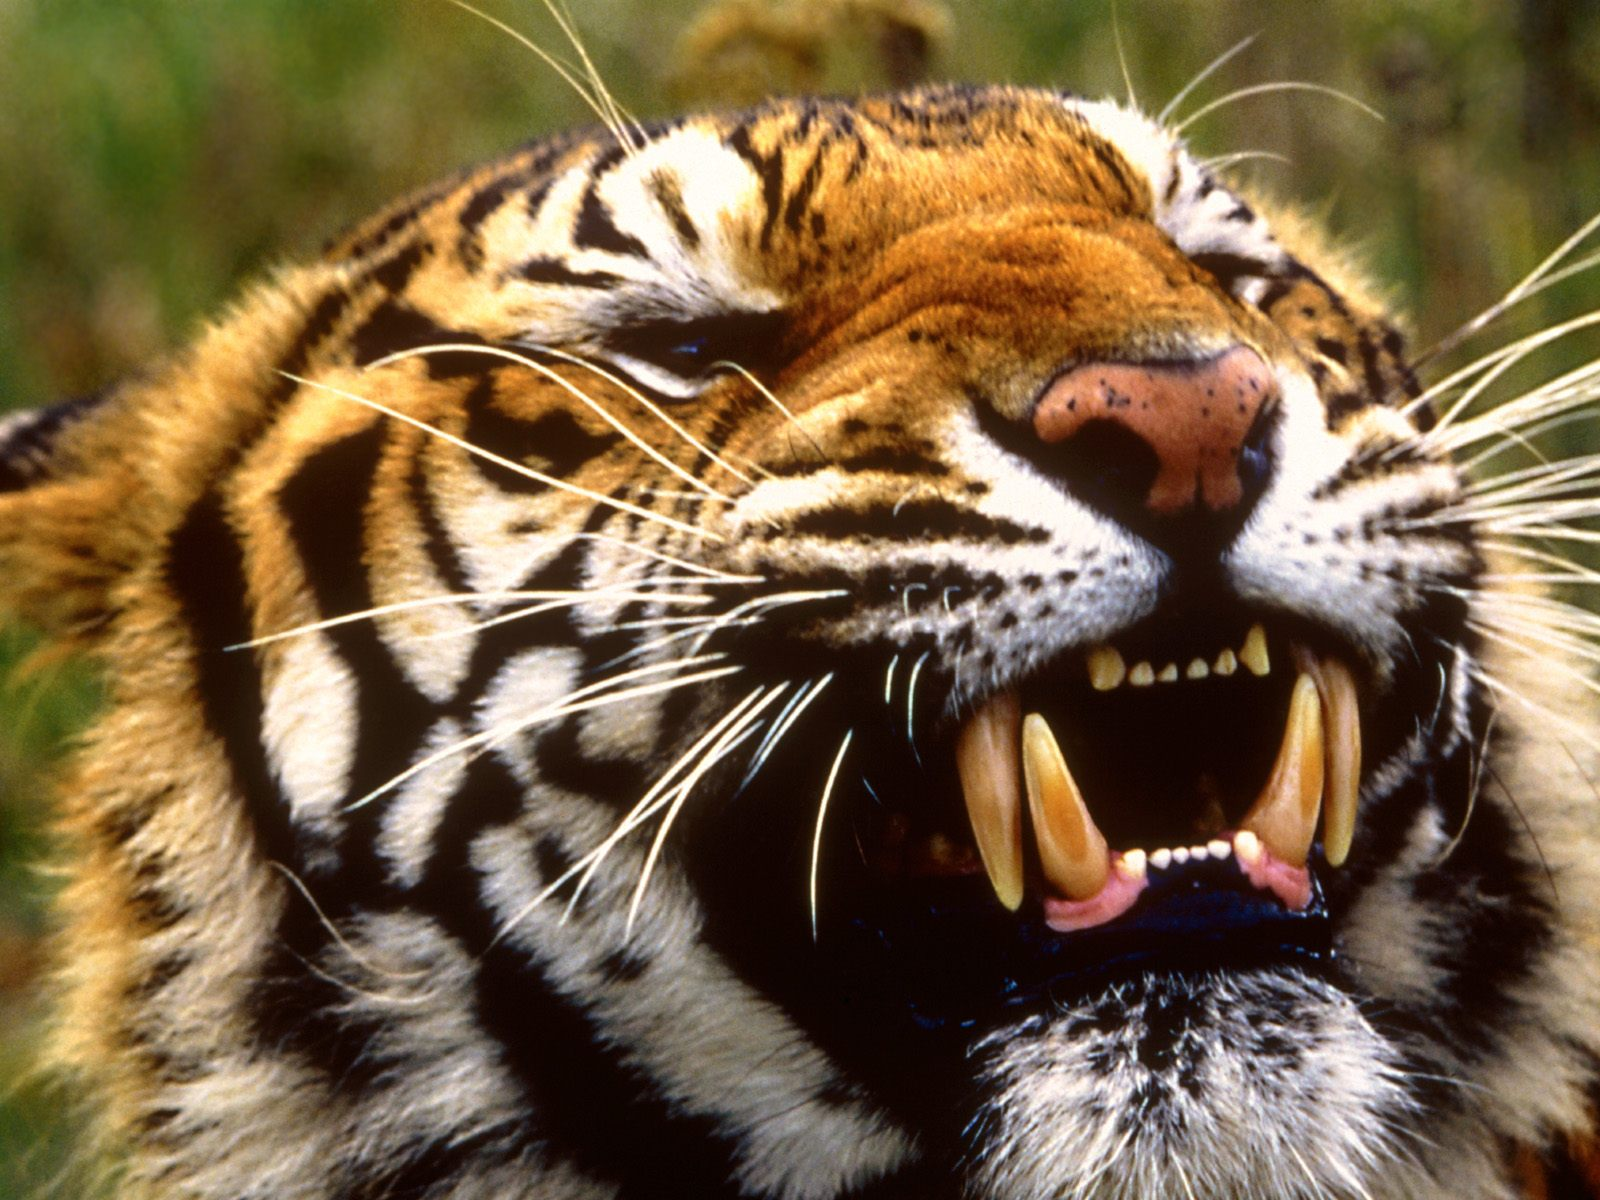 Tiger Hd Wallpaper 2013 HD Wallpaper 1600x1200